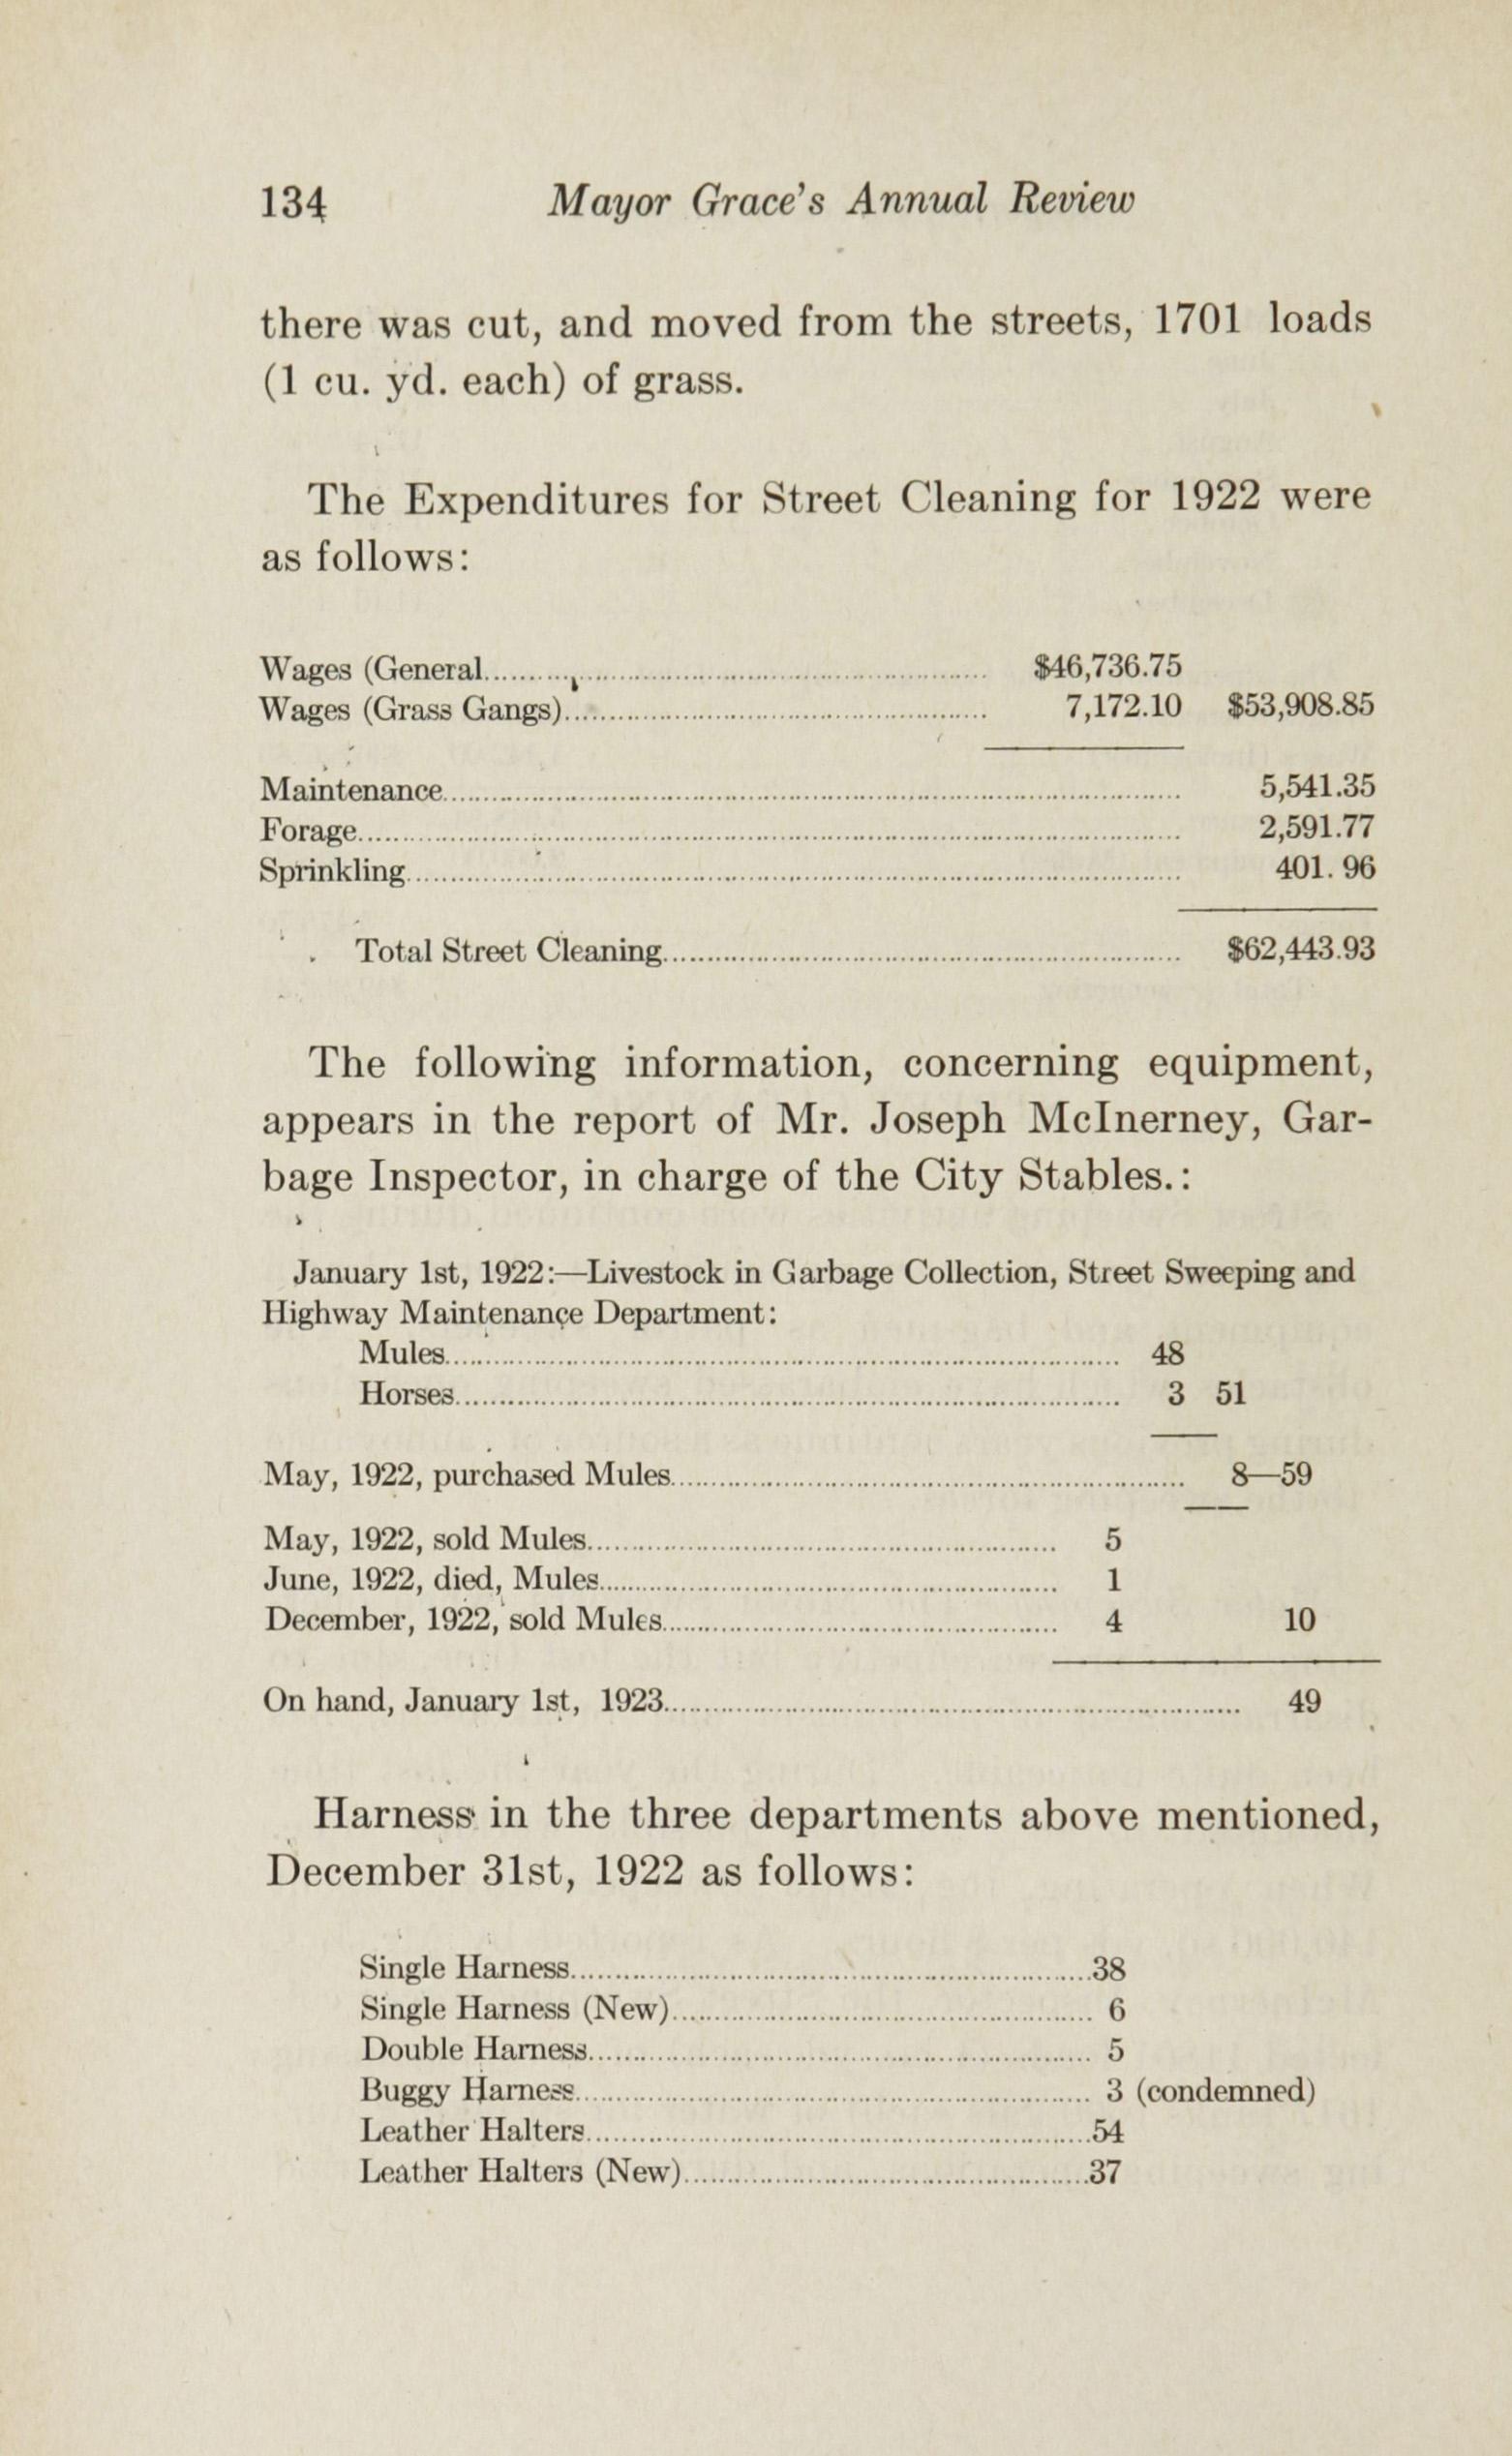 Charleston Yearbook, 1922, page 134